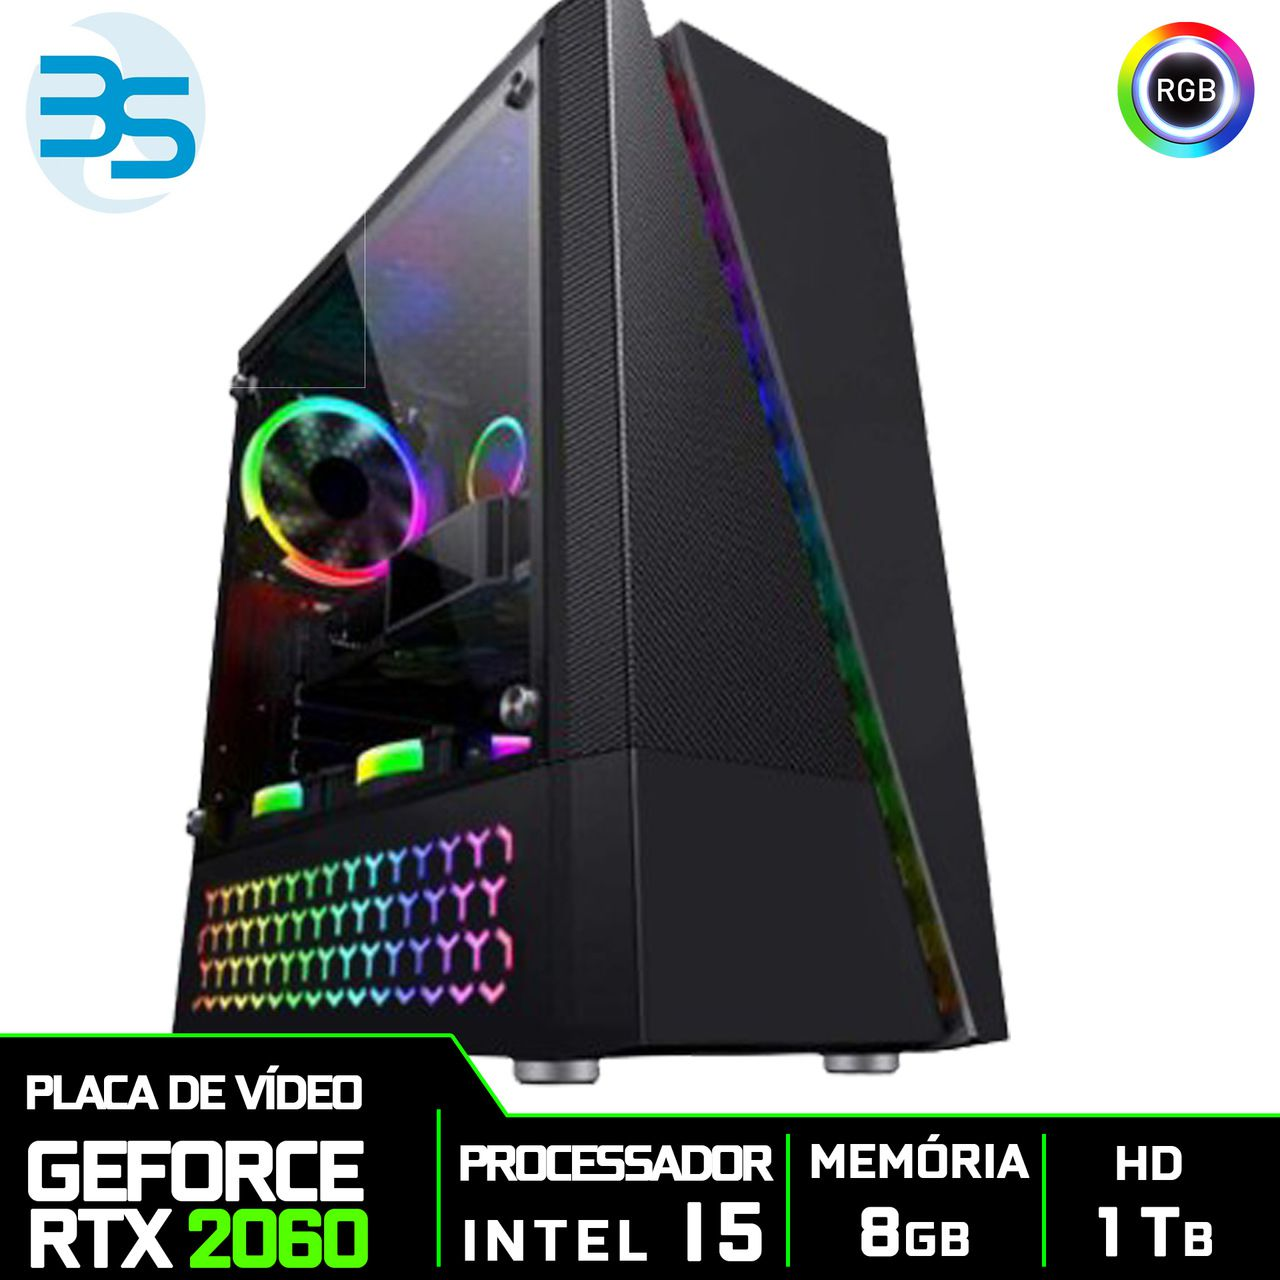 Bs Gamer Intel I5 9400F 2.9GHZ 9MB, 8GB DDR4, HD 1TB, 500W, RTX 2060 6 Gb